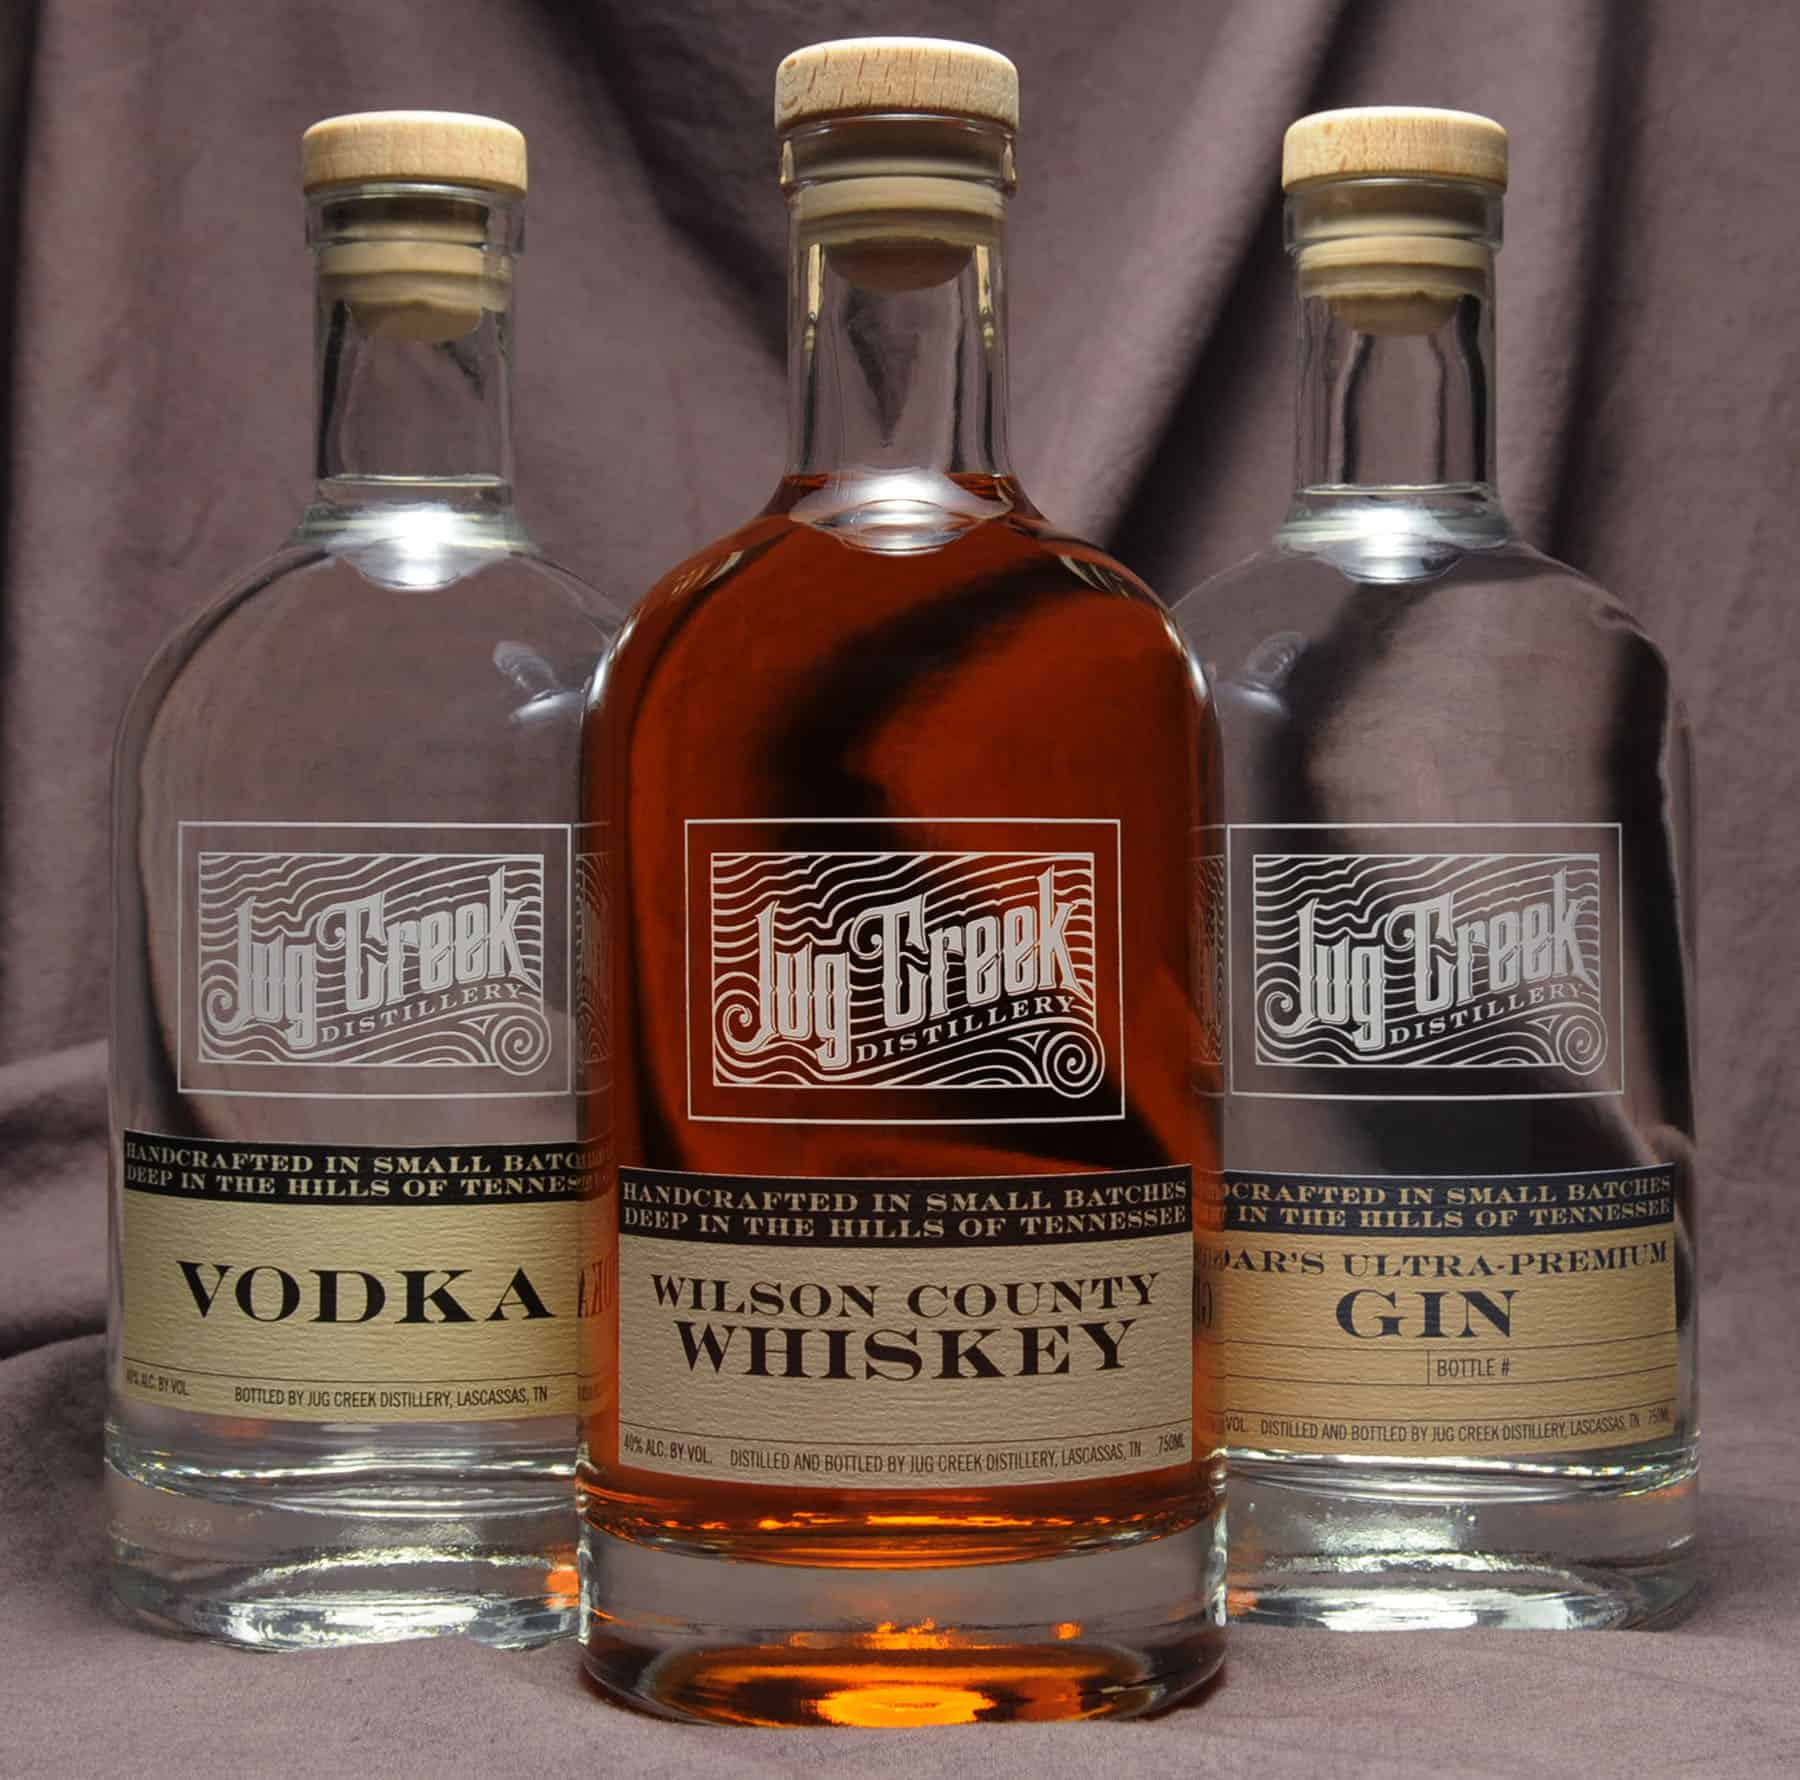 Jug Creek Vodka, Whiskey and Gin bottles